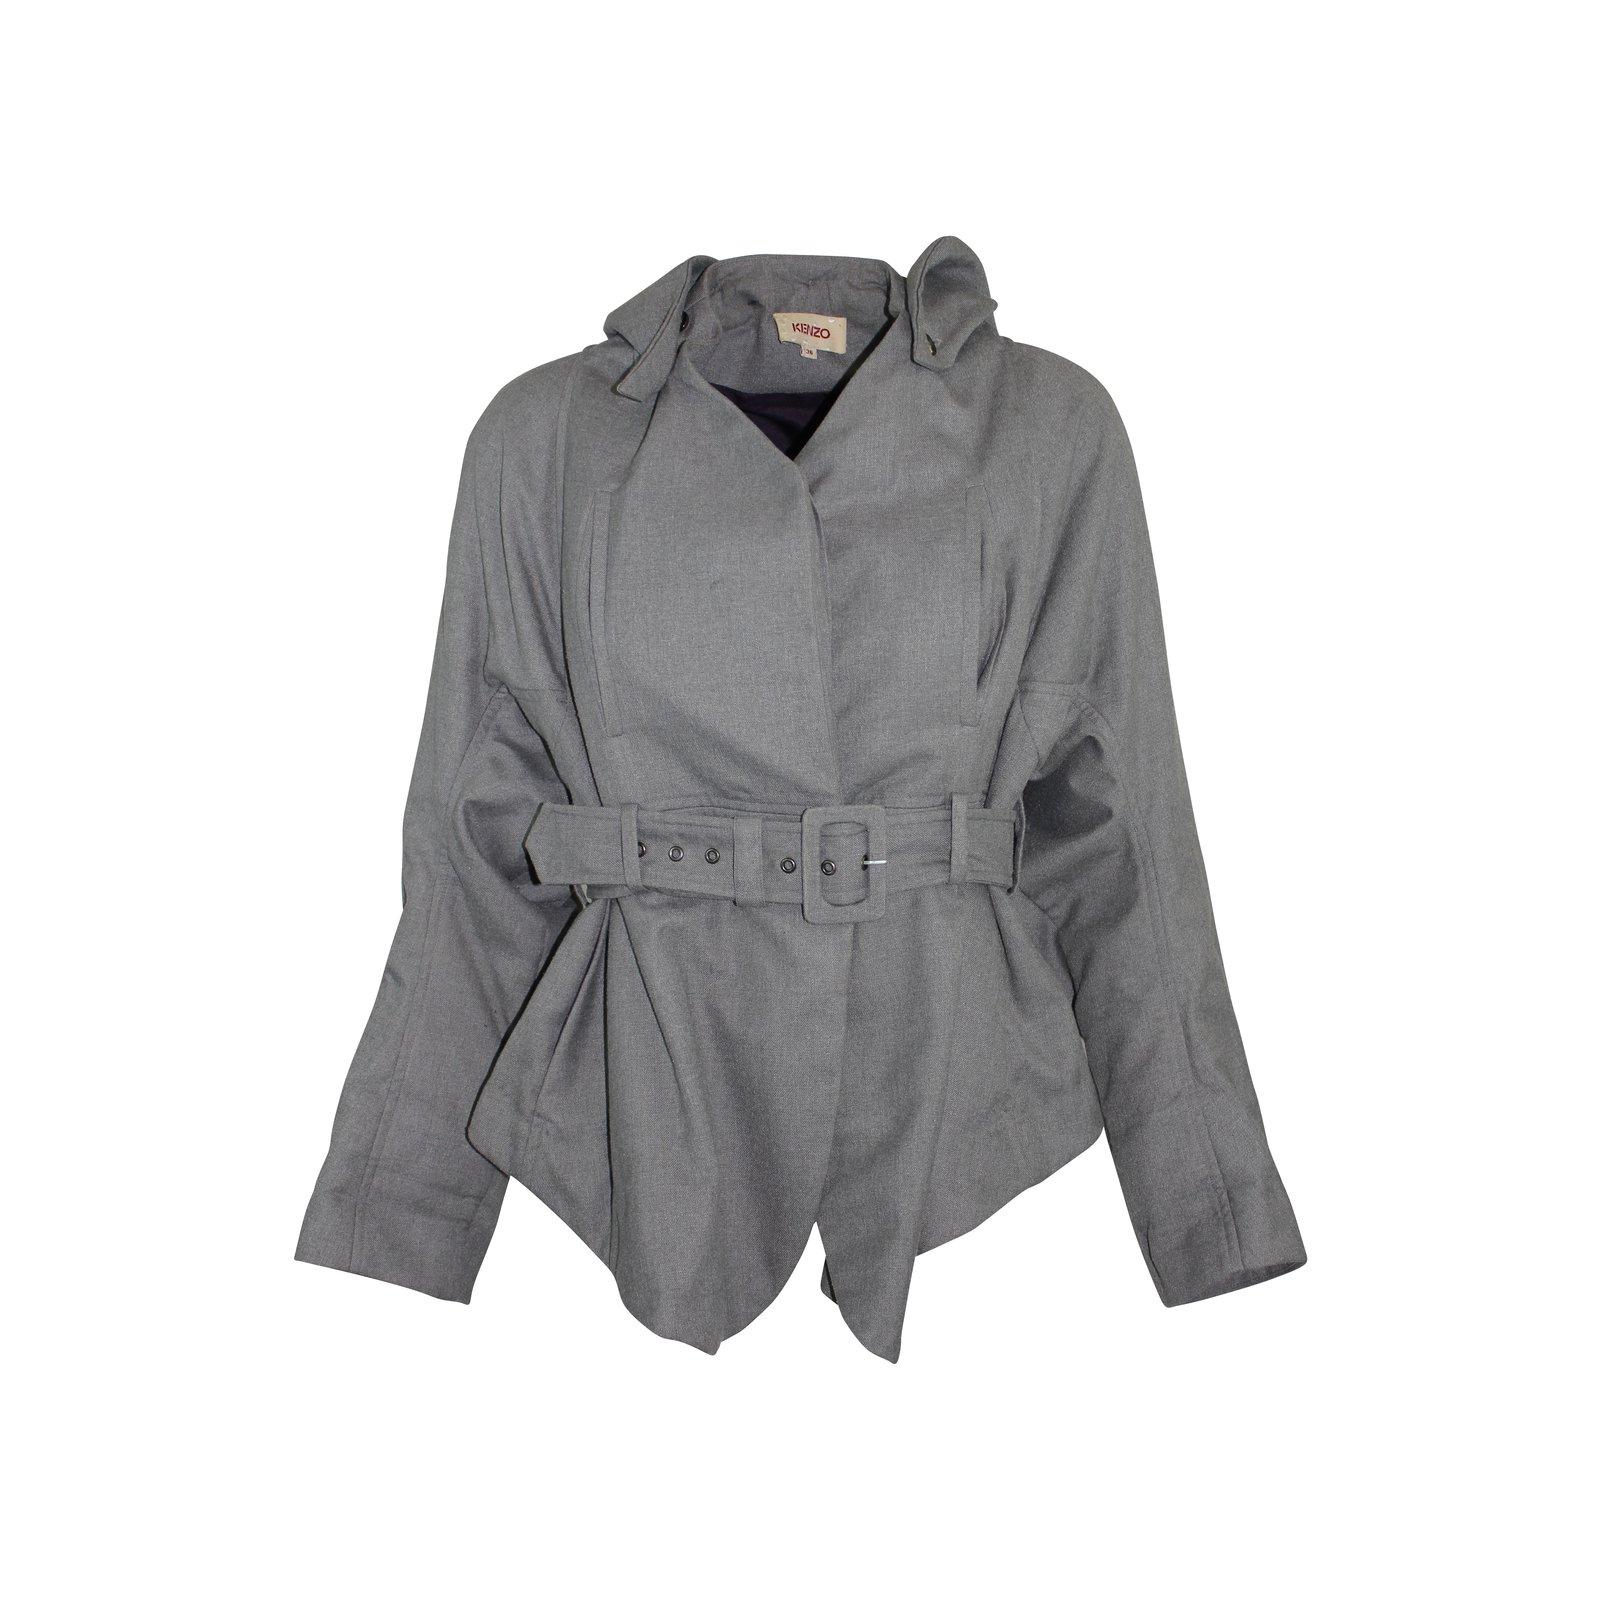 vestes kenzo veste avec capuche amovible soie polyester viscose gris joli closet. Black Bedroom Furniture Sets. Home Design Ideas